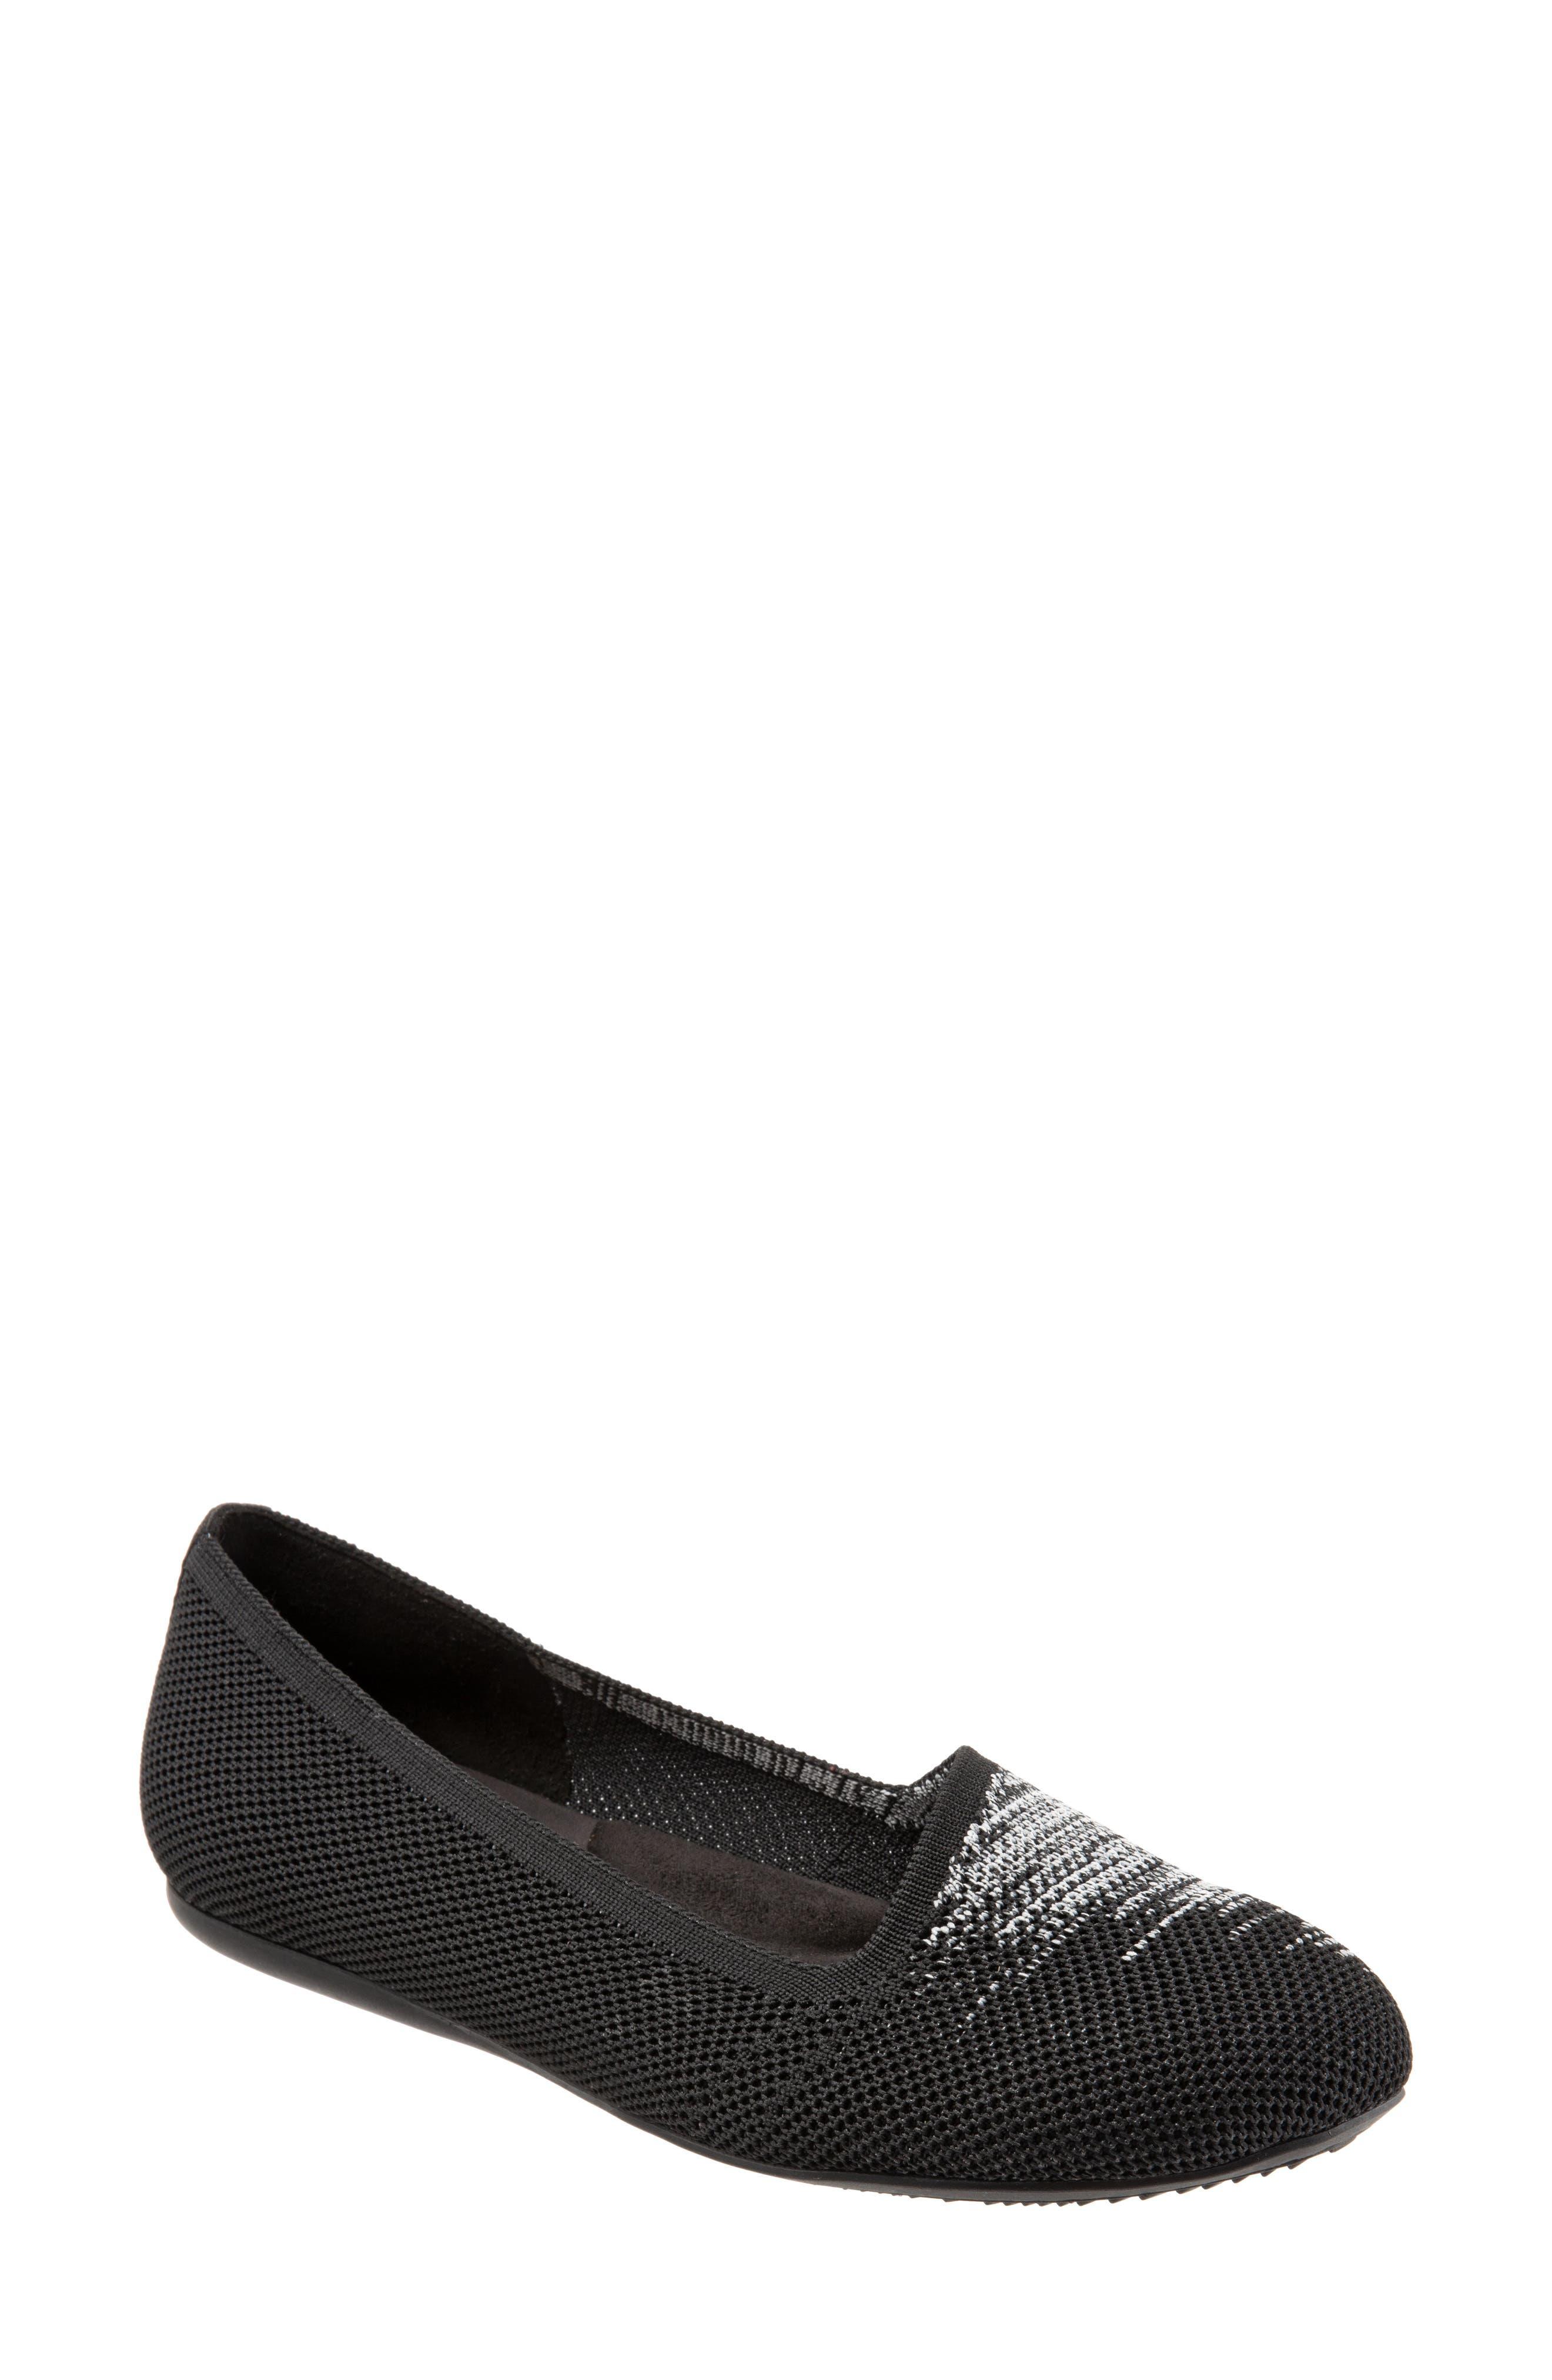 Sicily Knit Flat,                         Main,                         color, BLACK KNIT FABRIC